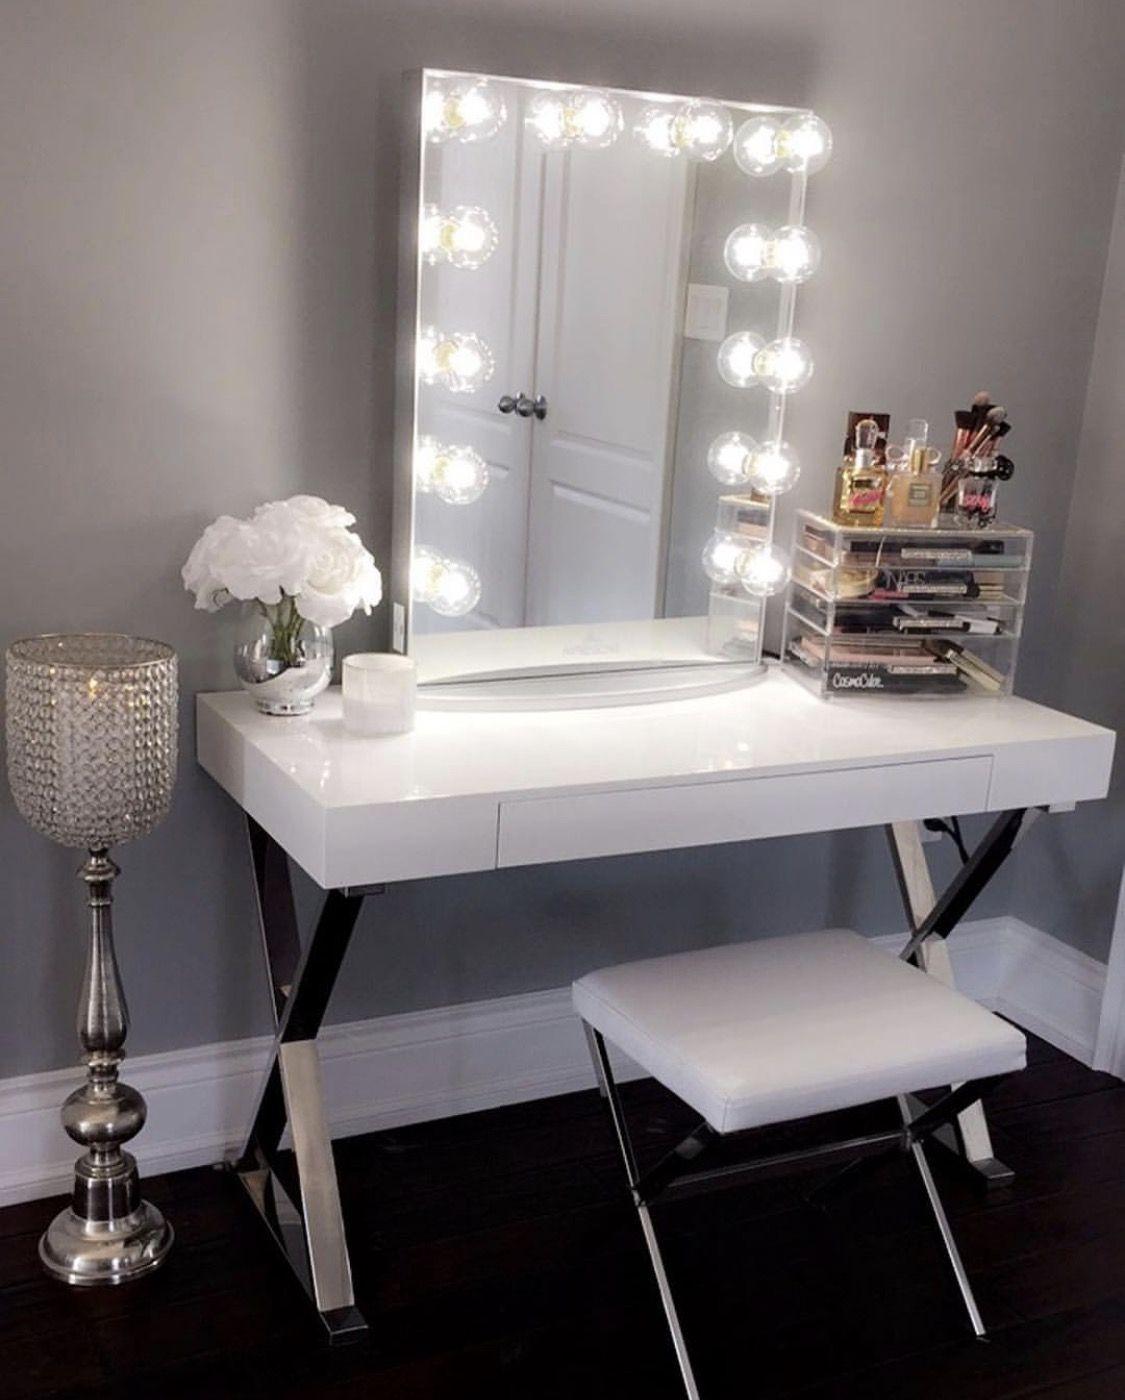 Impressions Vanity Co. Vanity design, Bedroom vanity